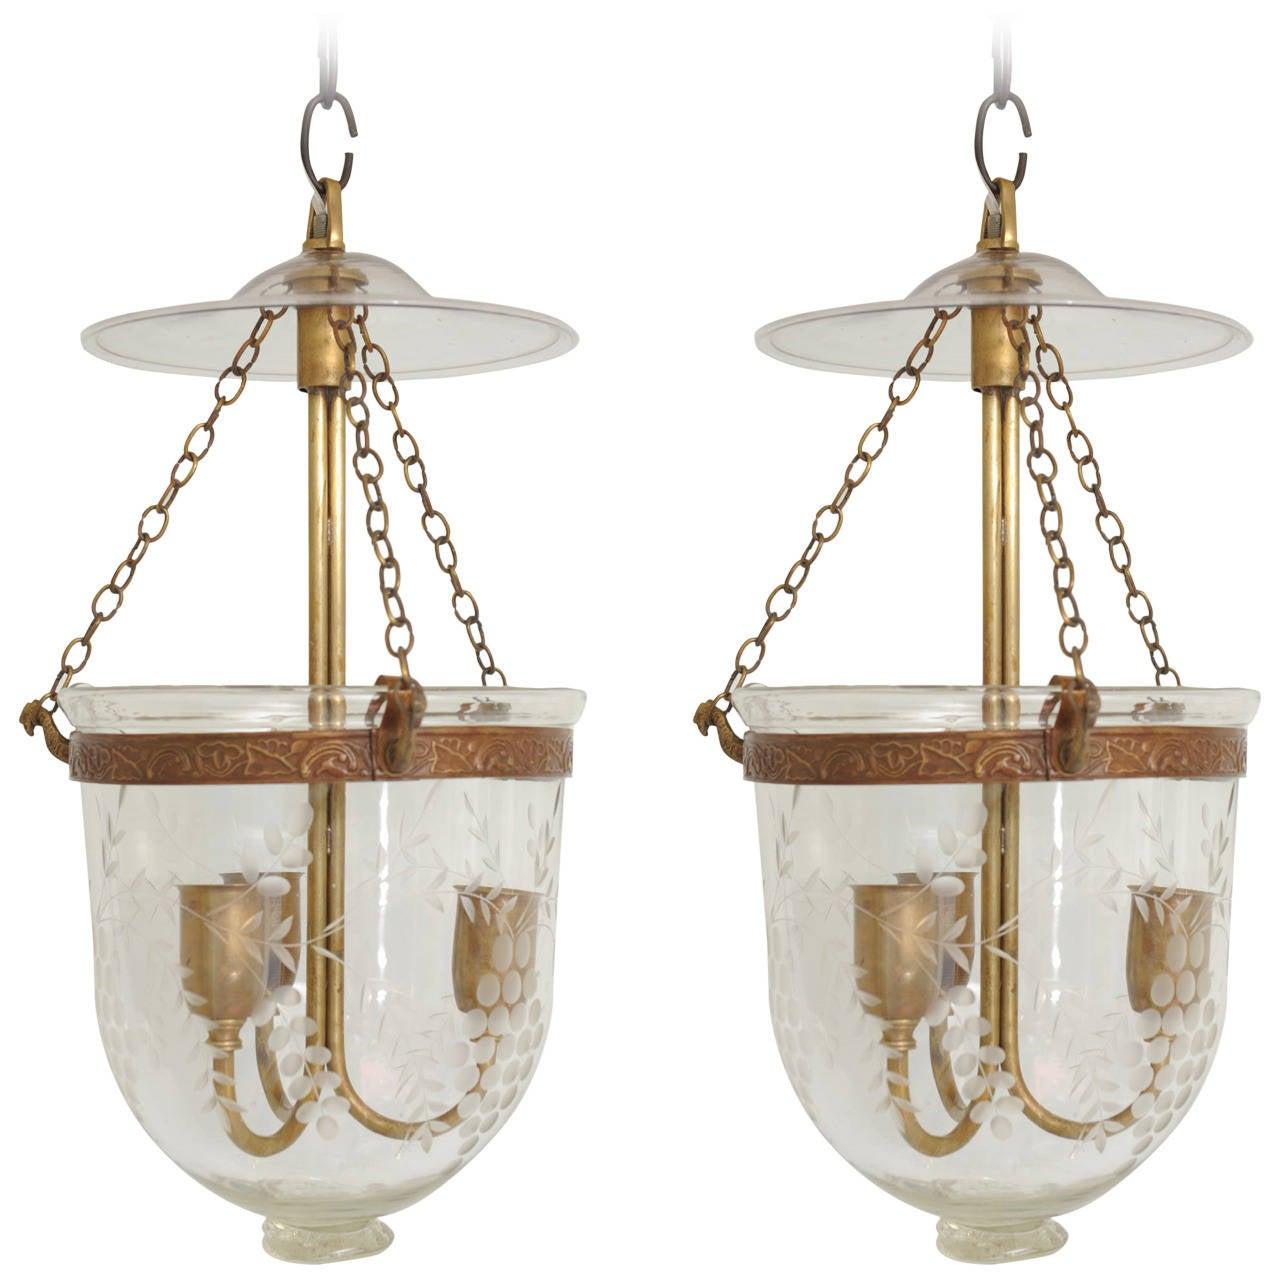 Pair Of Early 20th Century English Bell Jar Hall Lanterns